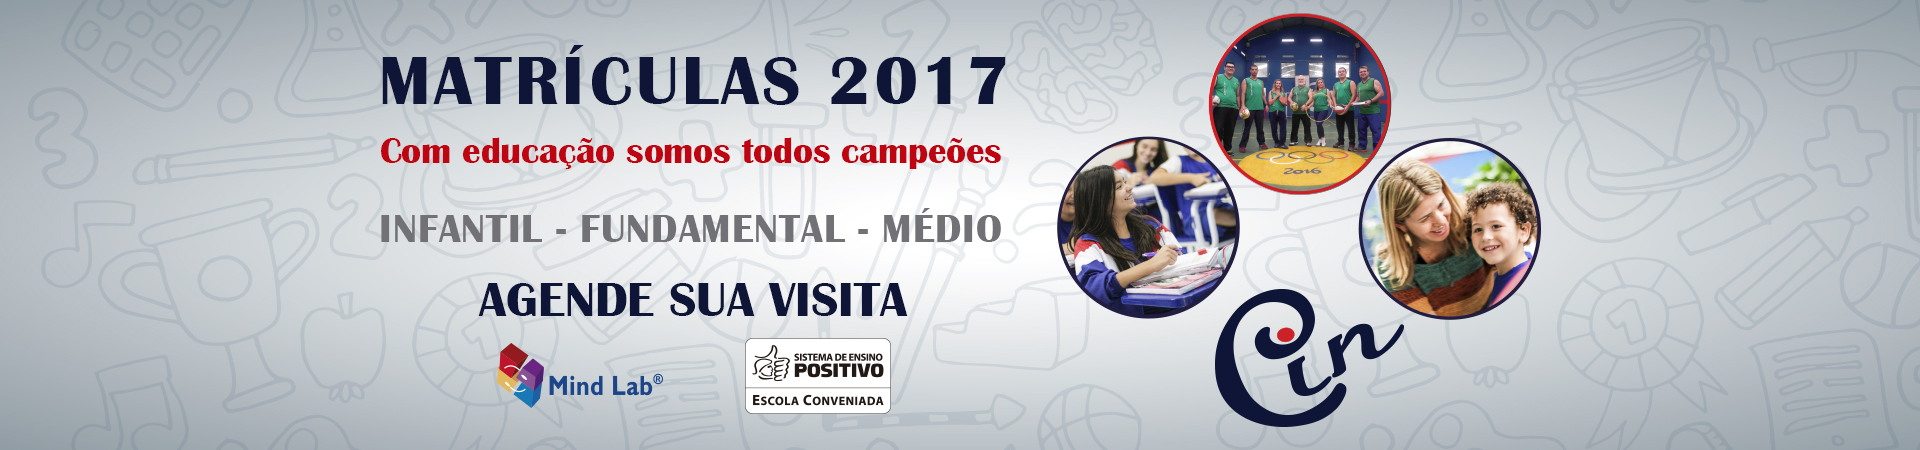 banner-site-campanha-2017-1